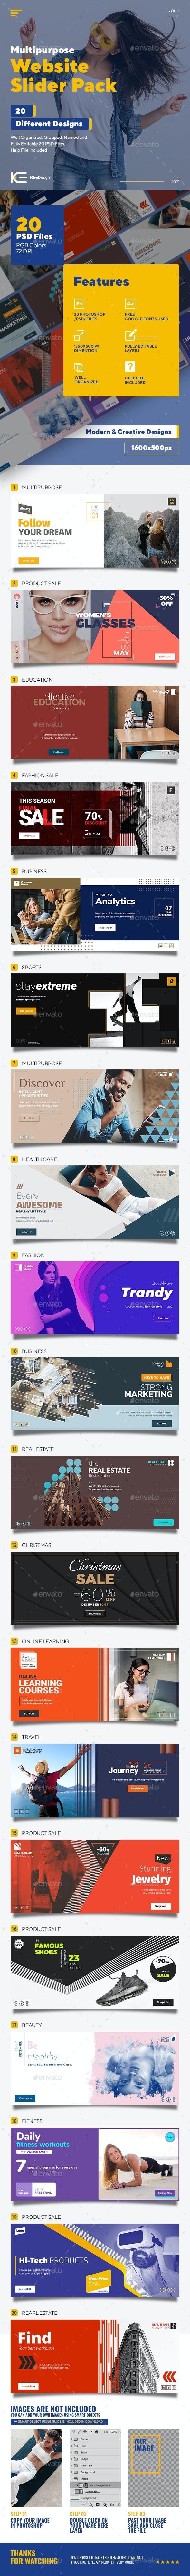 Multipurpose Web Site Slider Pack - Sliders & Features Web Elements